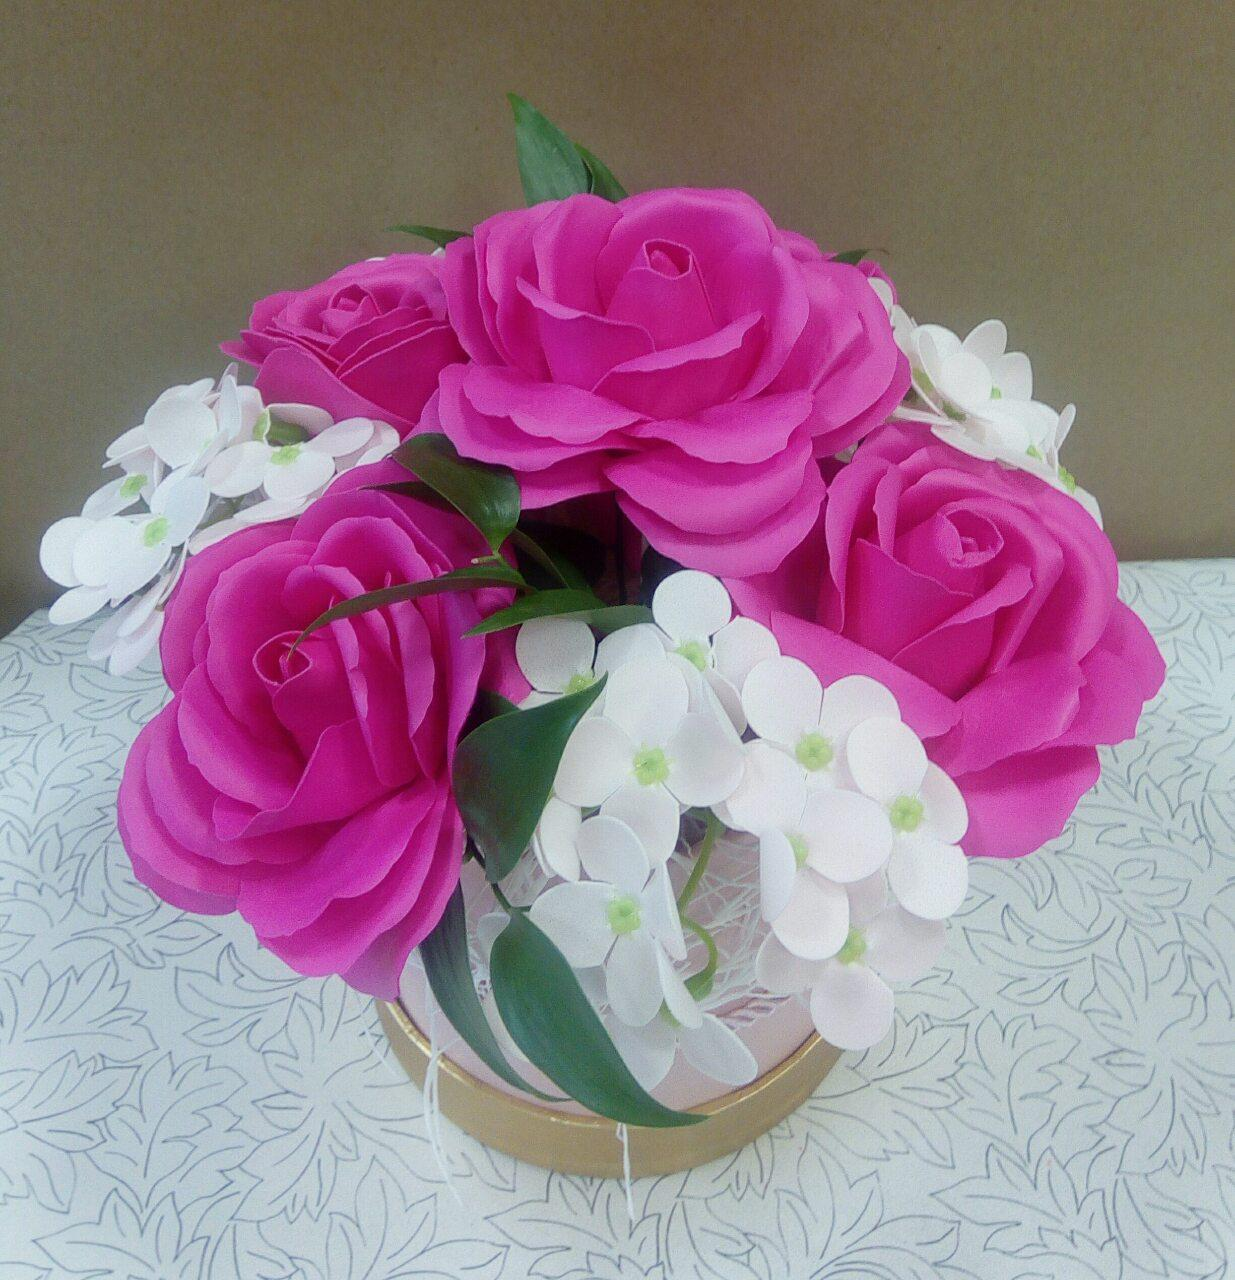 Фуксия, заказ цветов через интернет прокопьевск